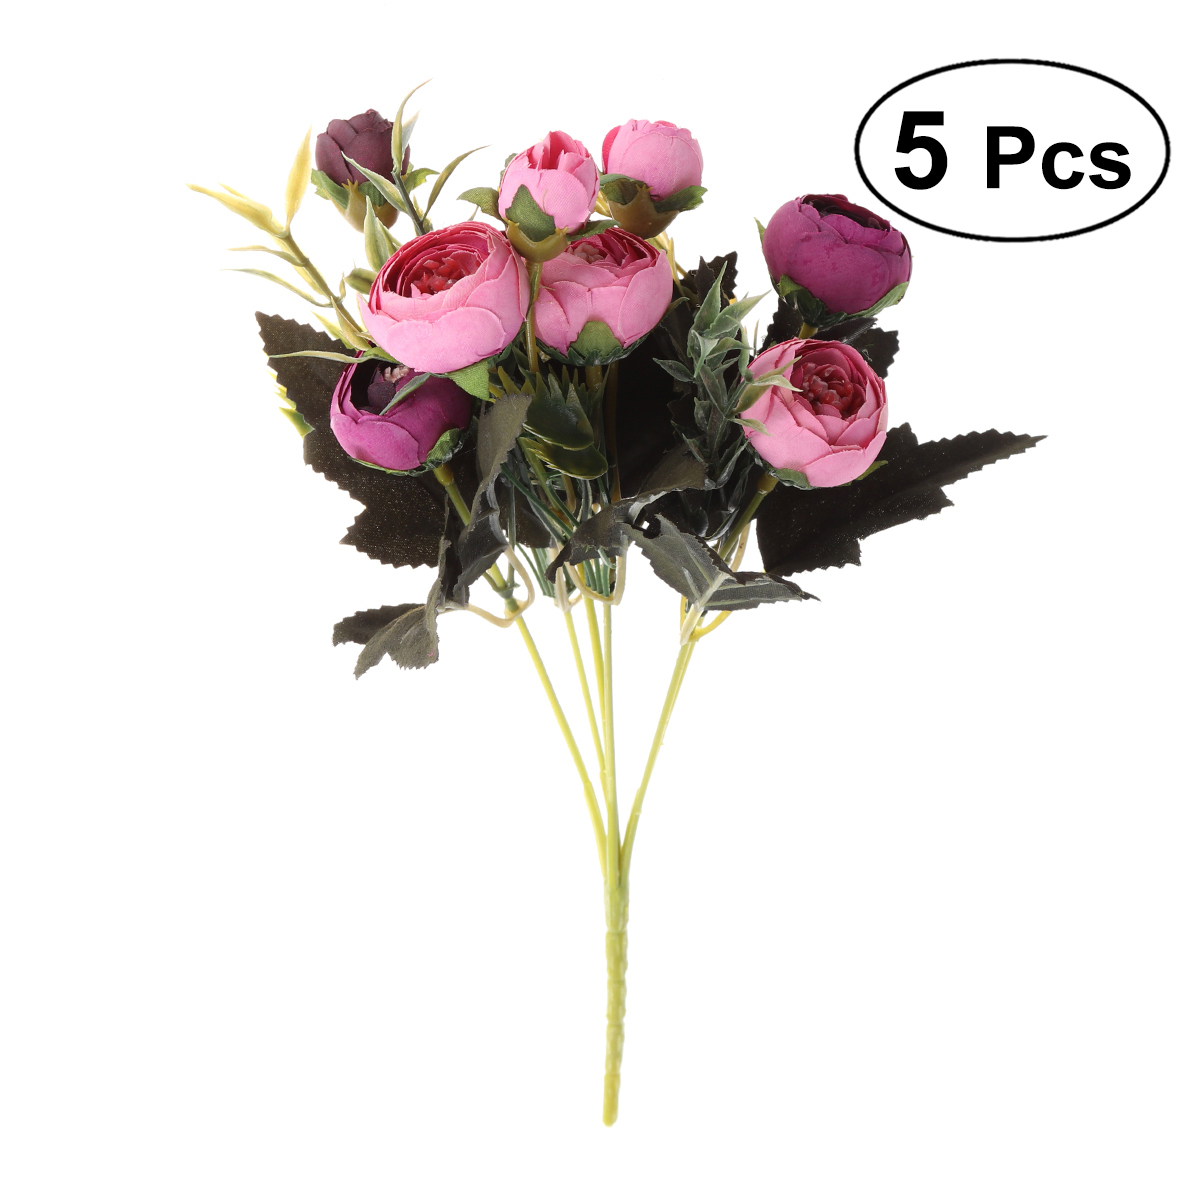 5 Pcs Buatan Camellia Sutra Batang Tunggal dengan 6 Cabang Tanaman Palsu  Simulasi untuk Pesta Pernikahan Dekorasi Rumah a52877487a